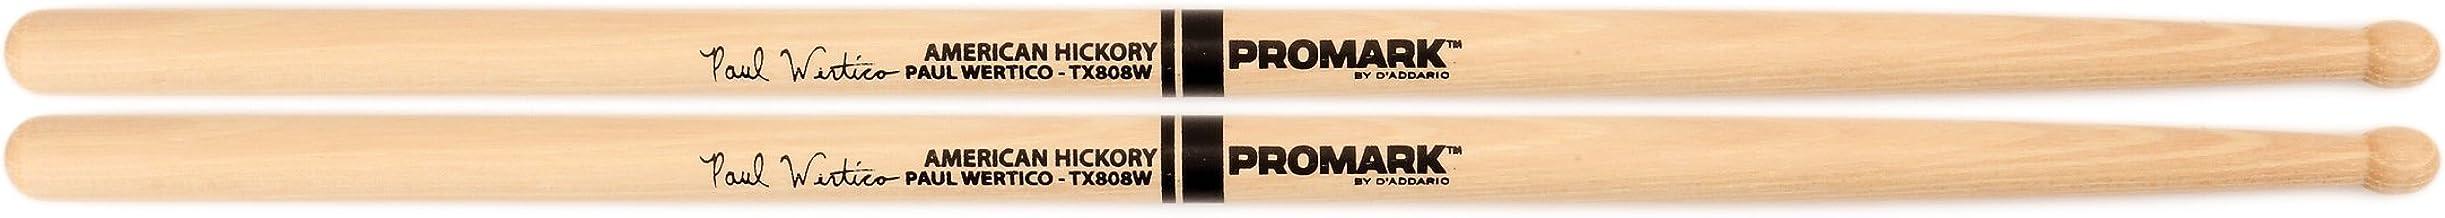 PROMARK プロマーク ドラムスティック シグネイチャーシリーズ Paul Wertico ヒッコリー WoodTip TX808W (406 x 14.7mm) 【国内正規品】